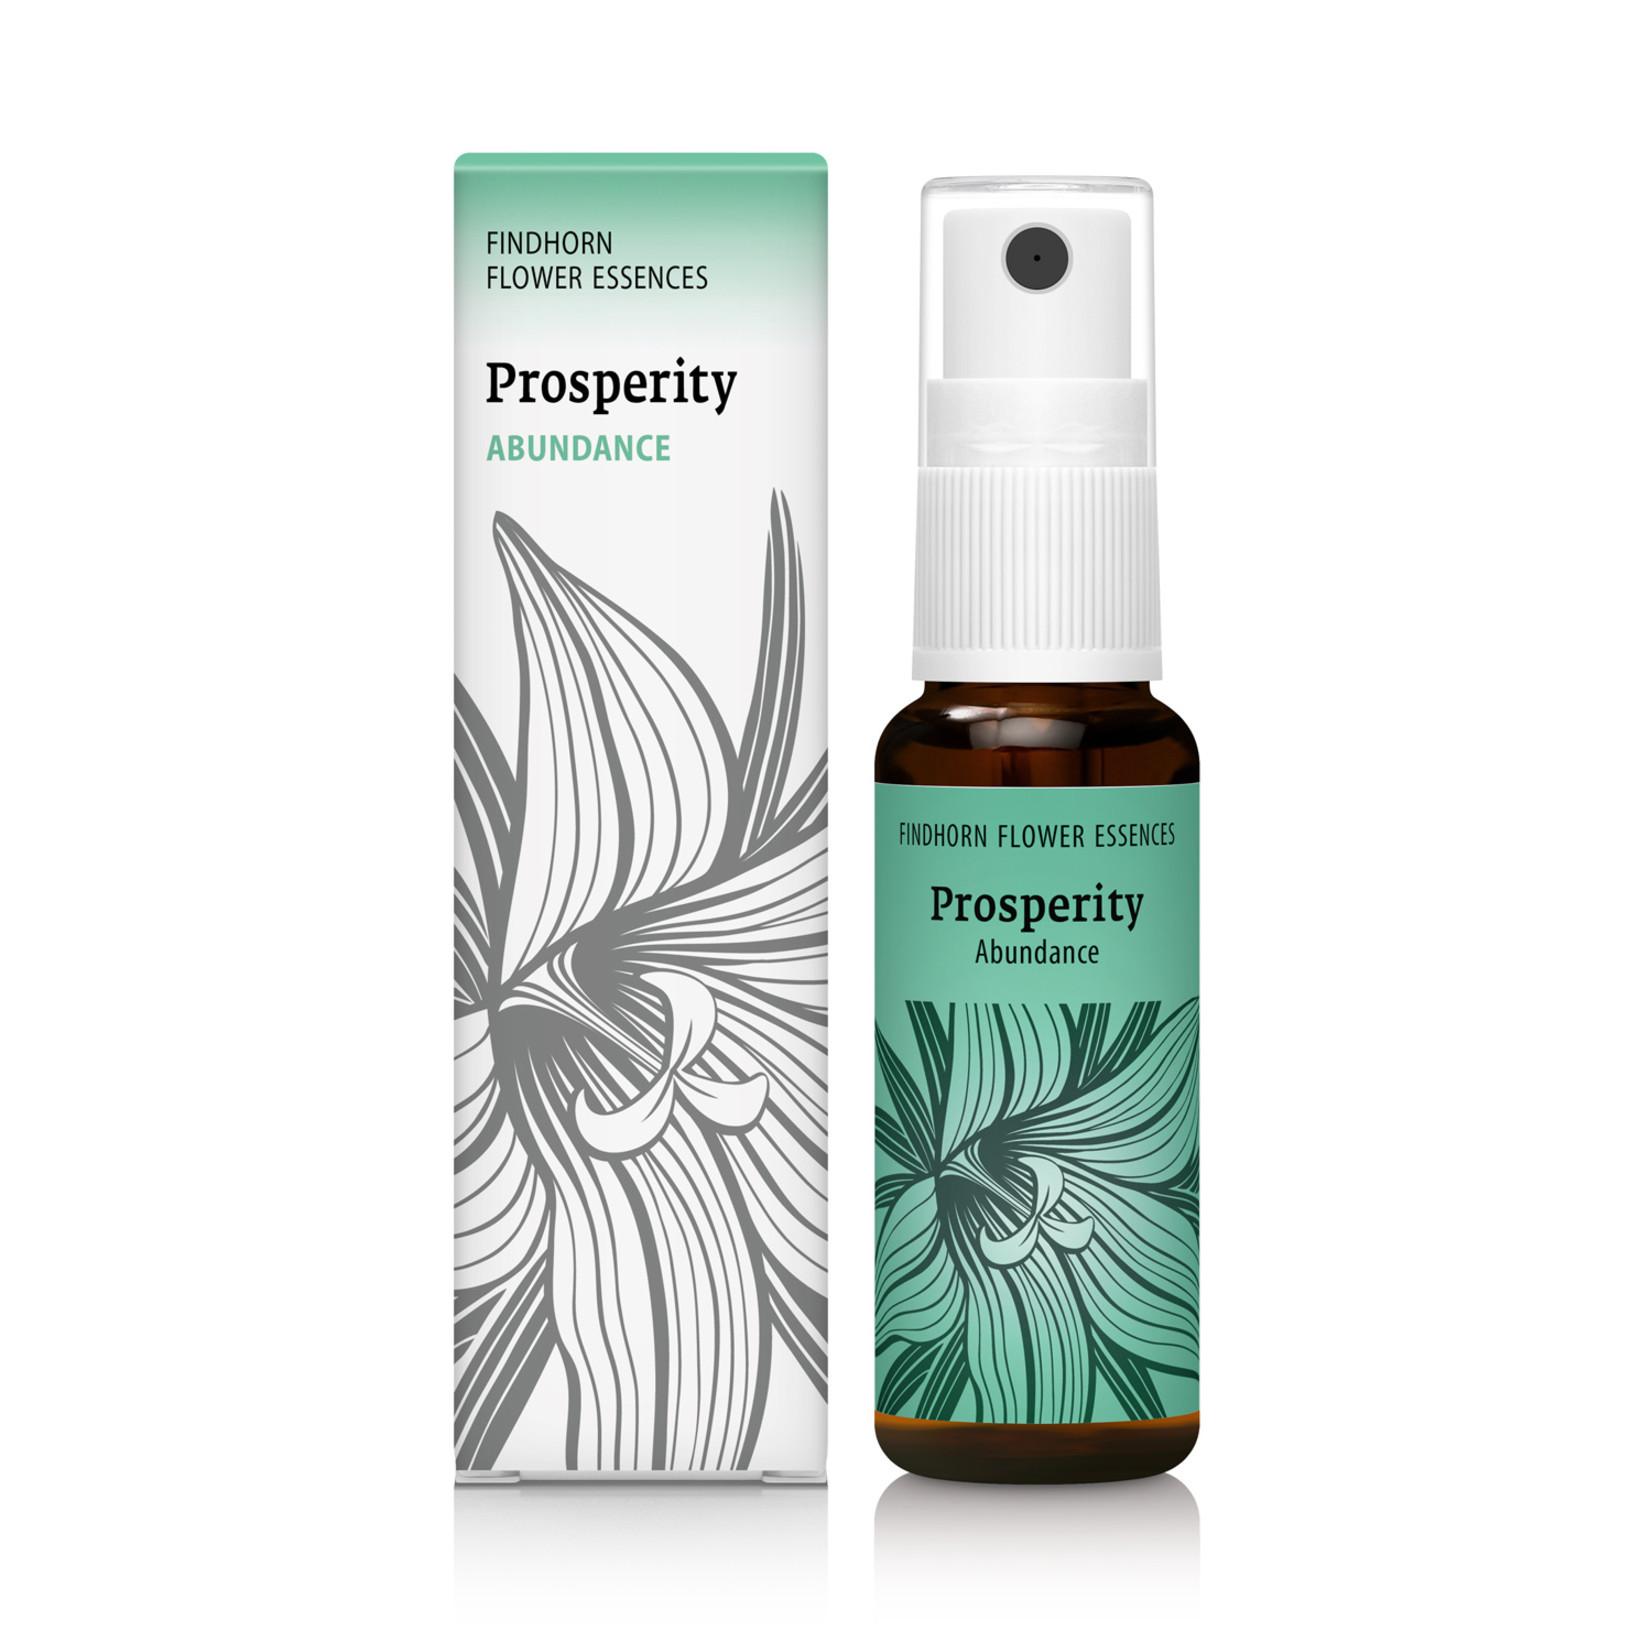 Findhorn Essences Findhorn Essences 'Prosperity' bloesemspray - angst voor tekort transformeren